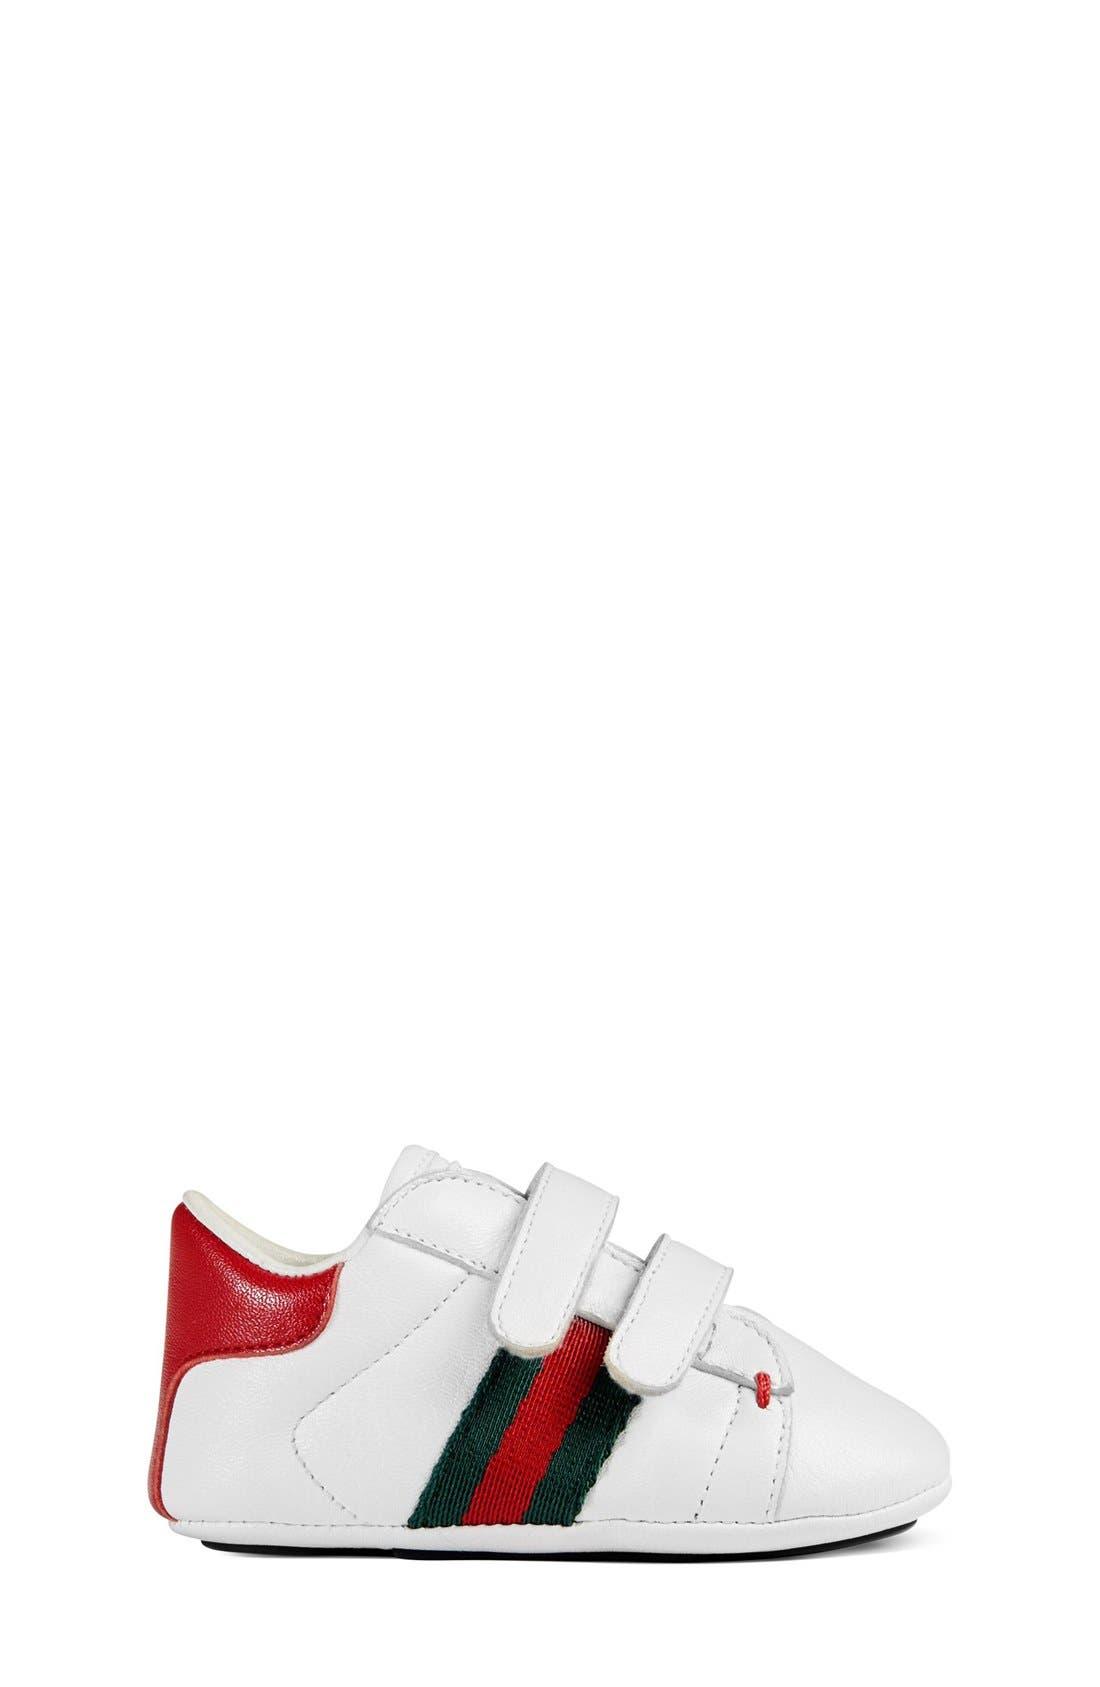 'Ace' Crib Shoe,                             Alternate thumbnail 6, color,                             100